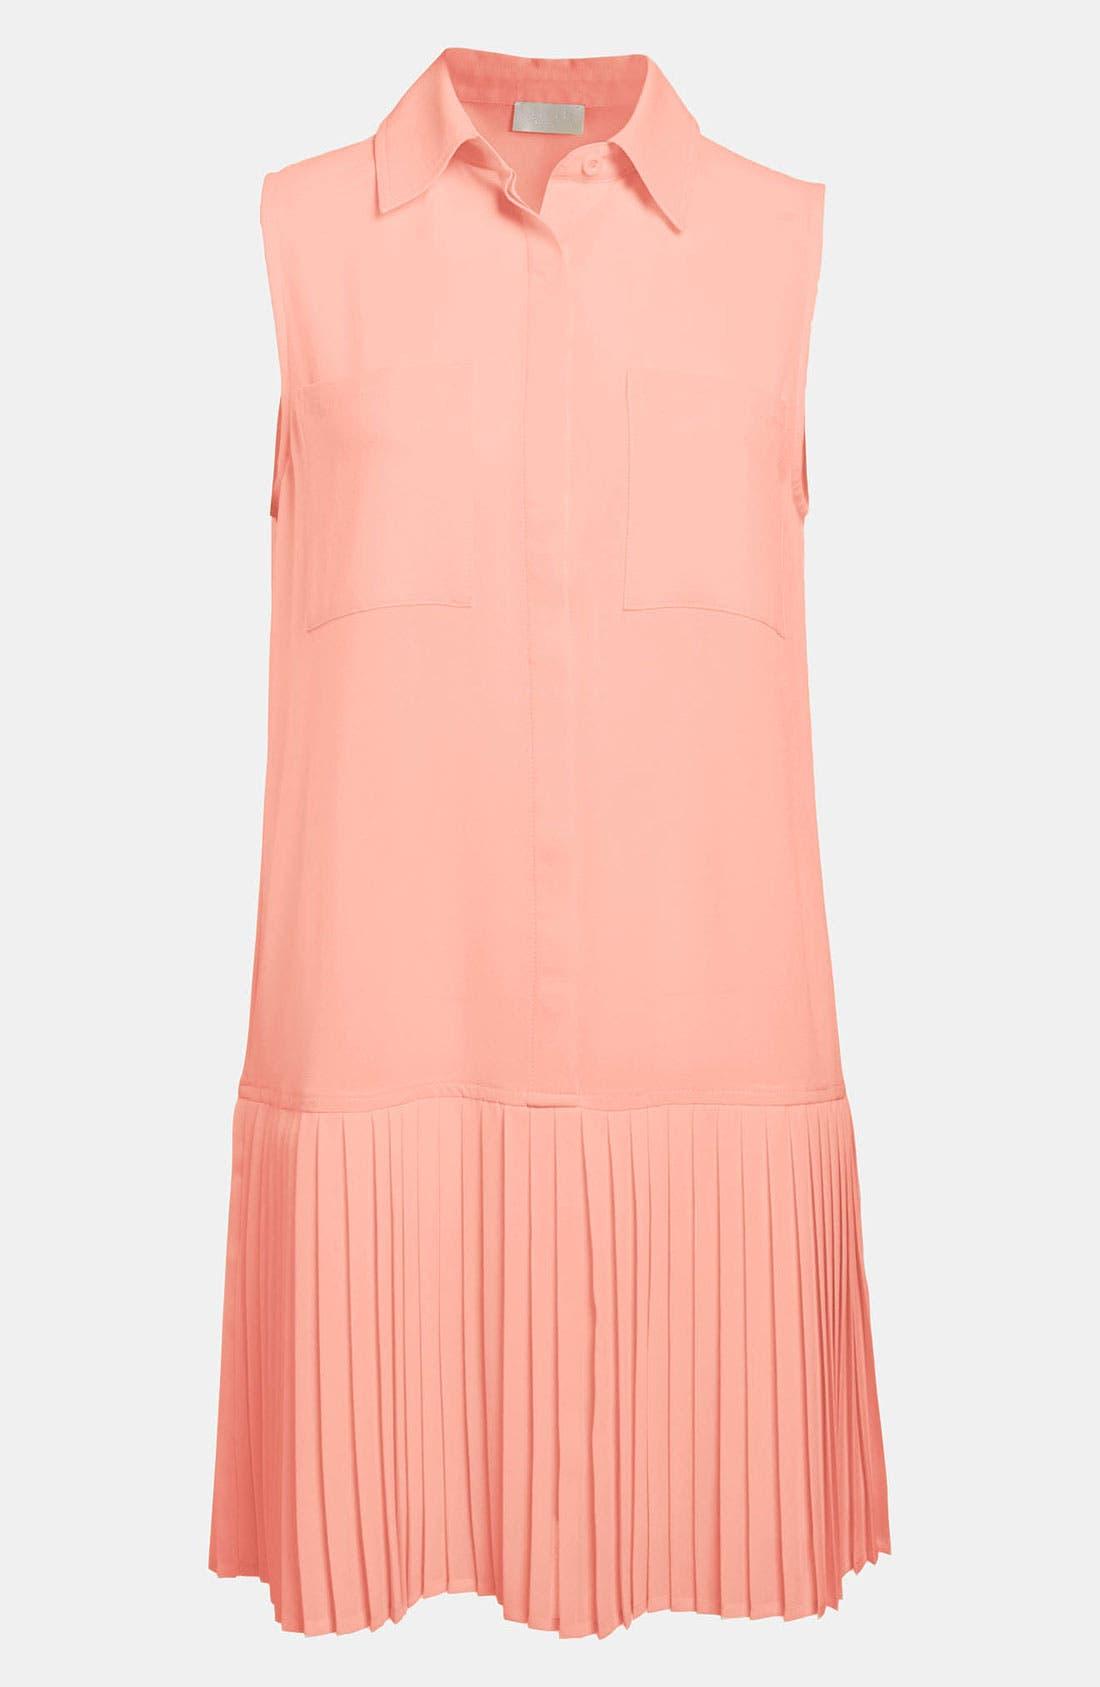 Alternate Image 1 Selected - ASTR Pleated Skirt Drop Waist Dress